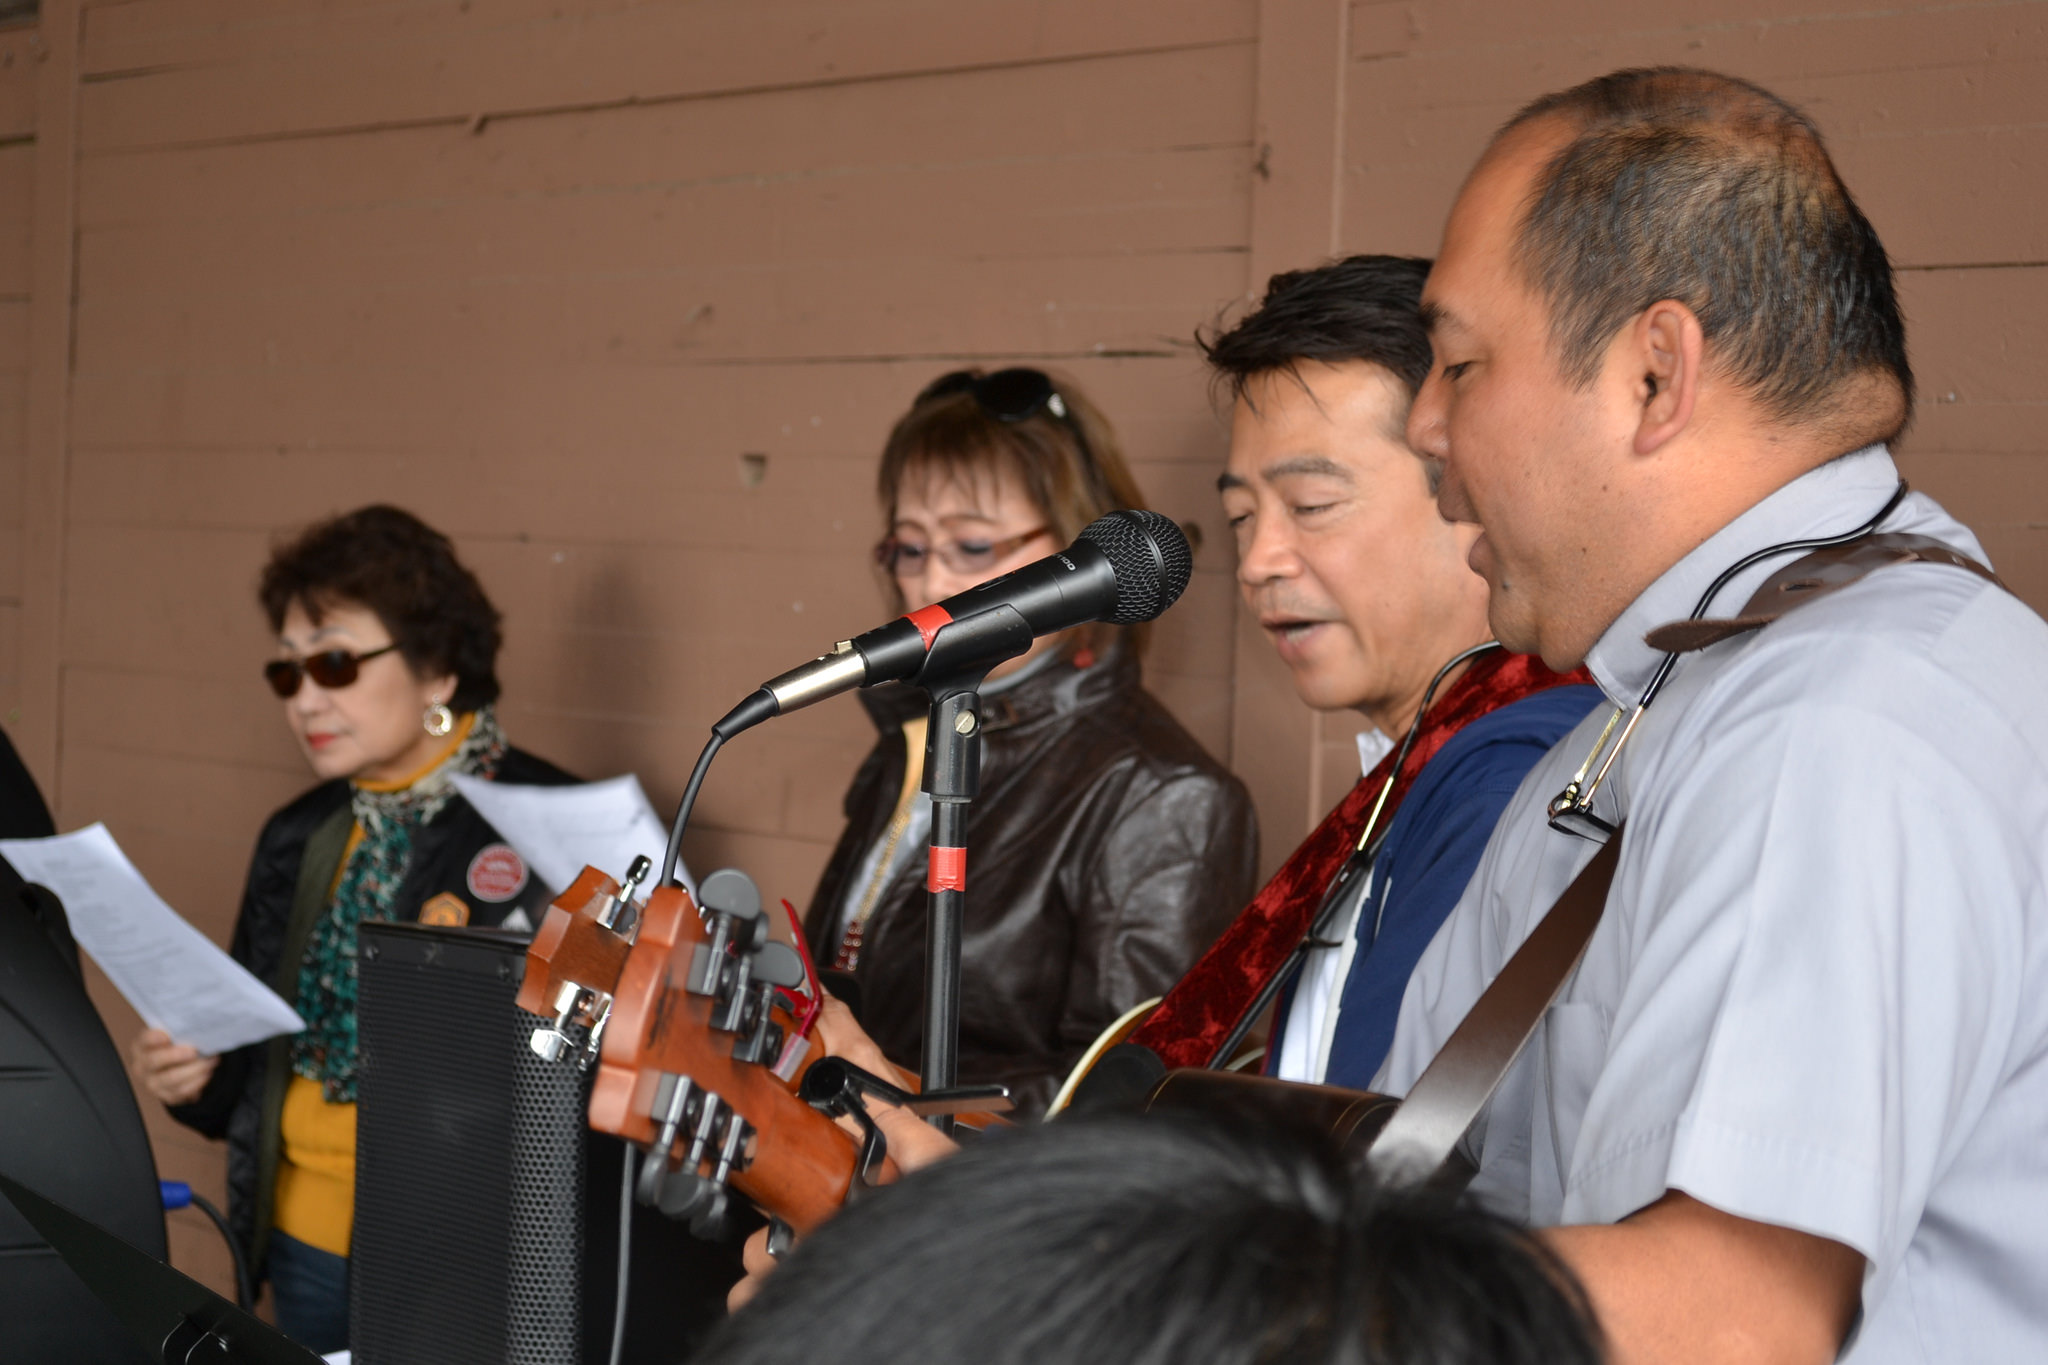 Rev. Leonard Oakes on guitar singing with HCSM choir members